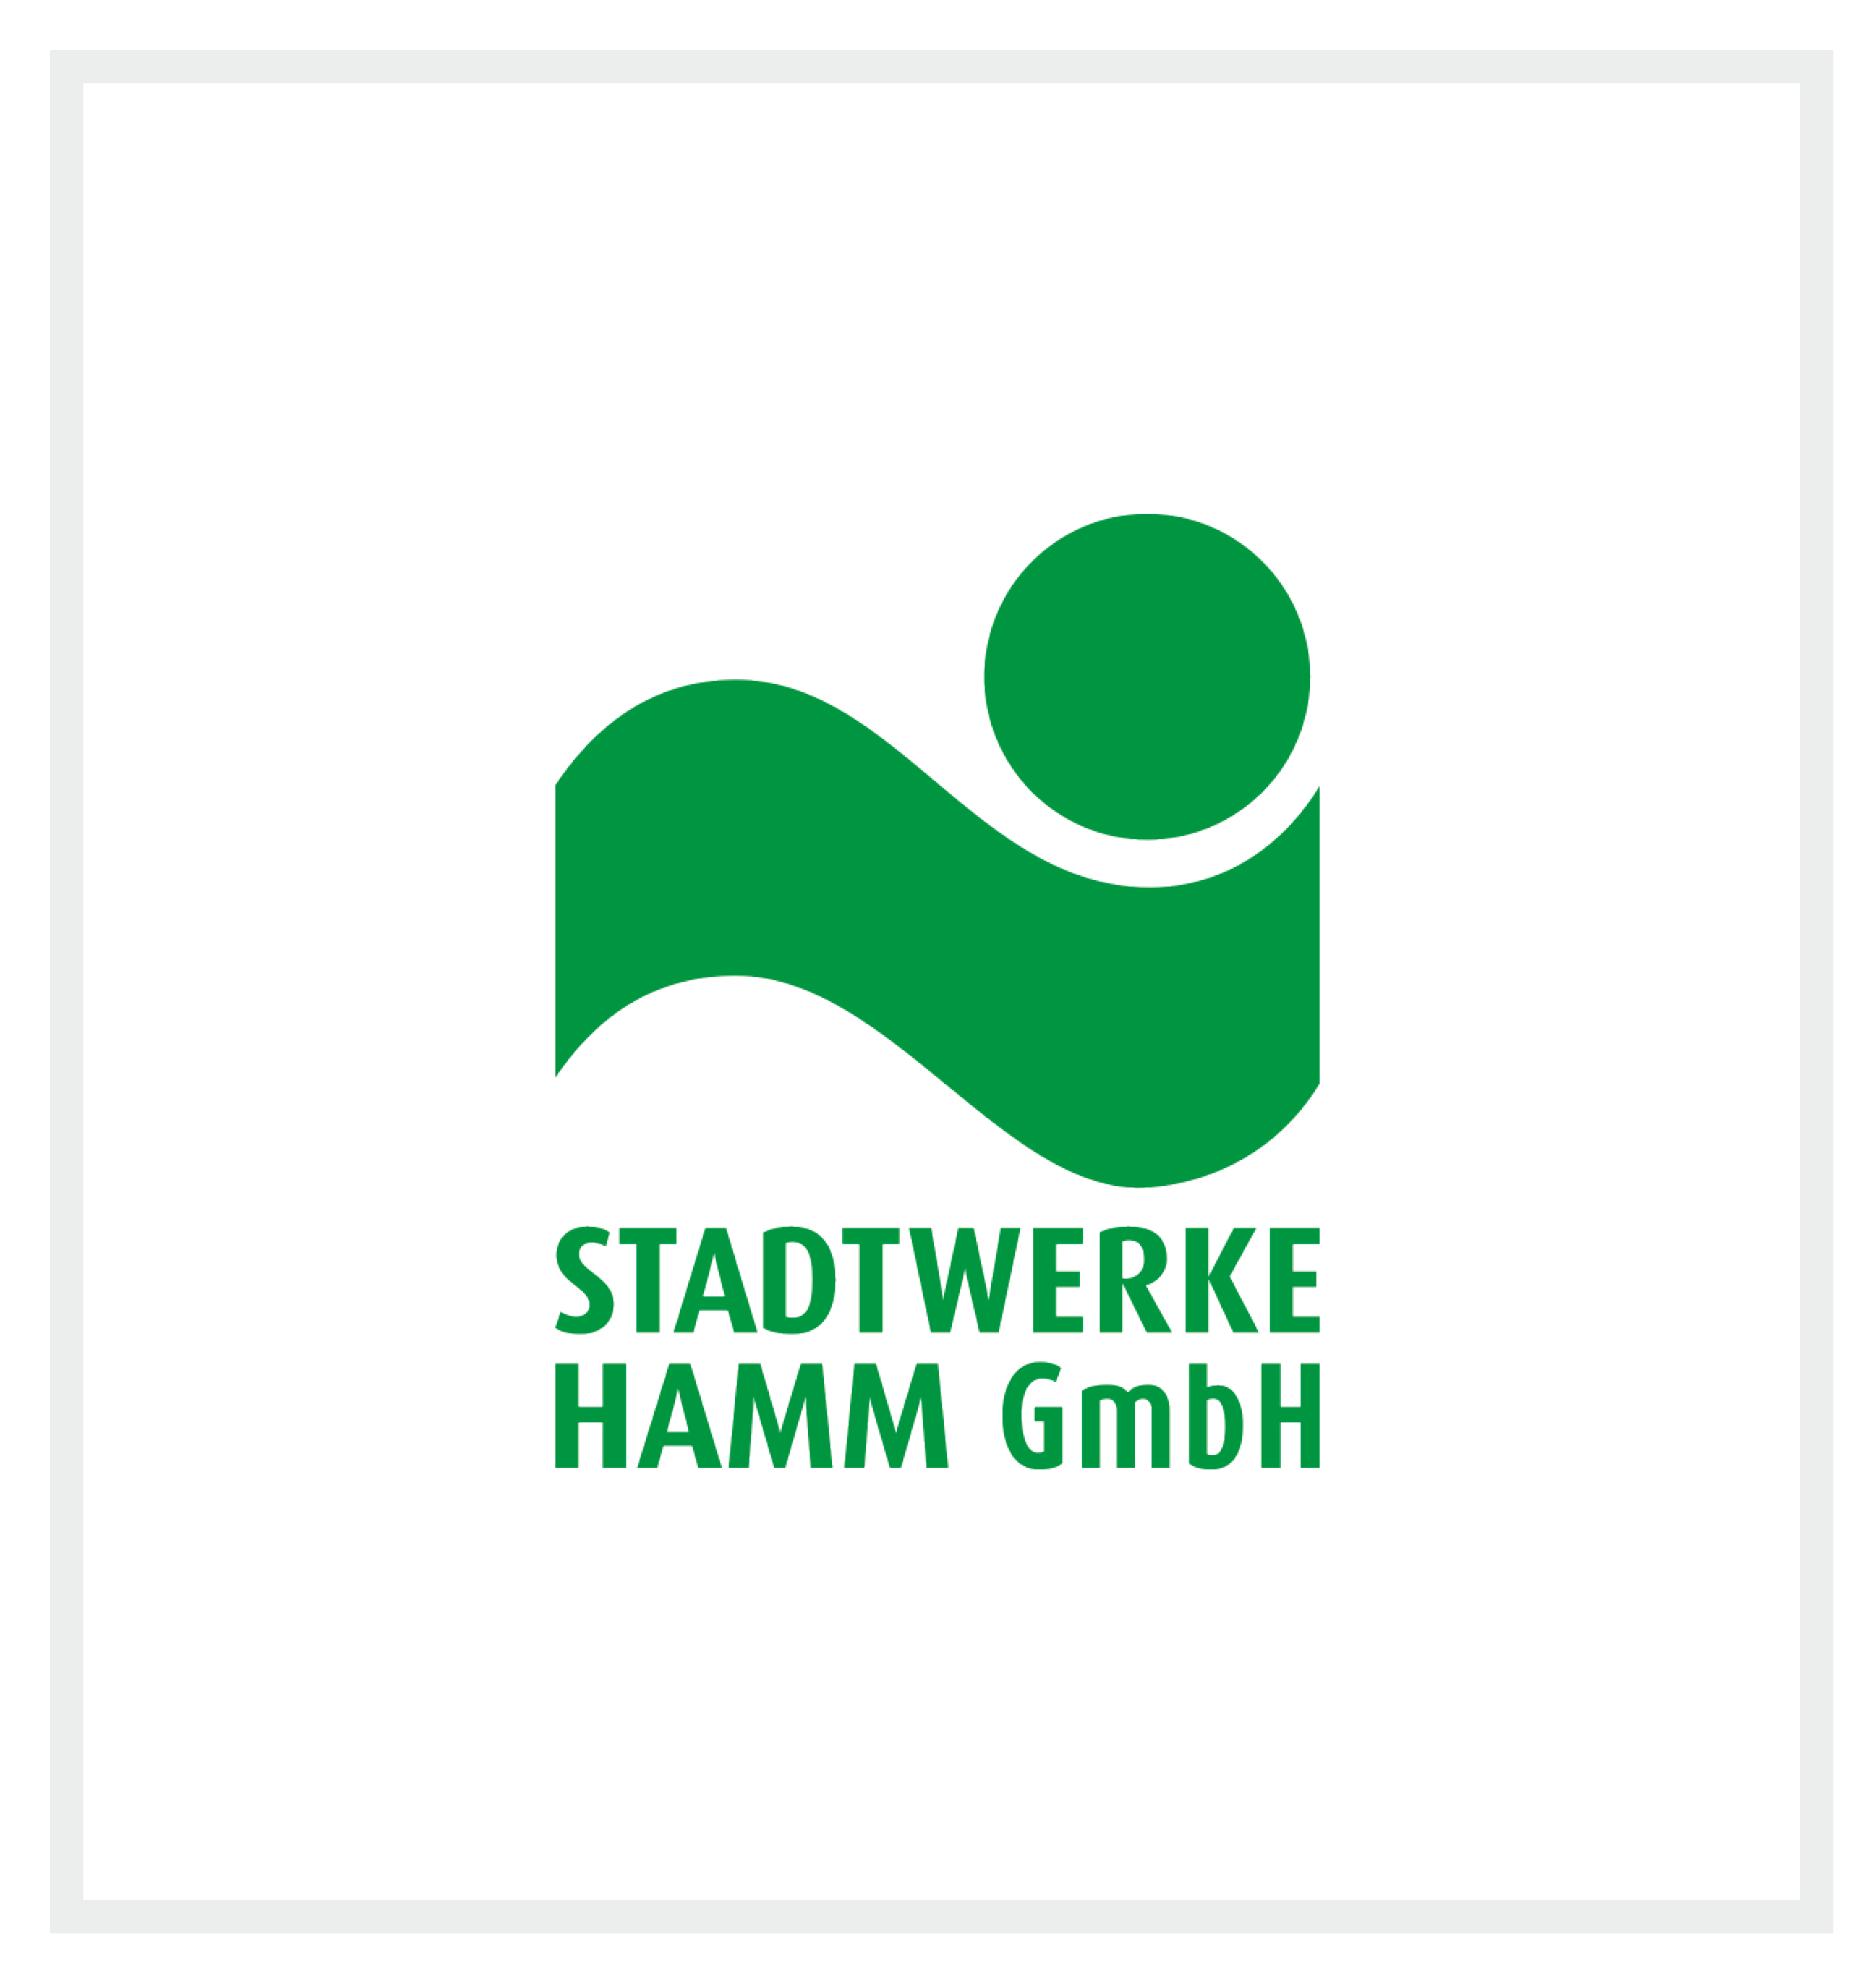 stadtwerke hamm logo